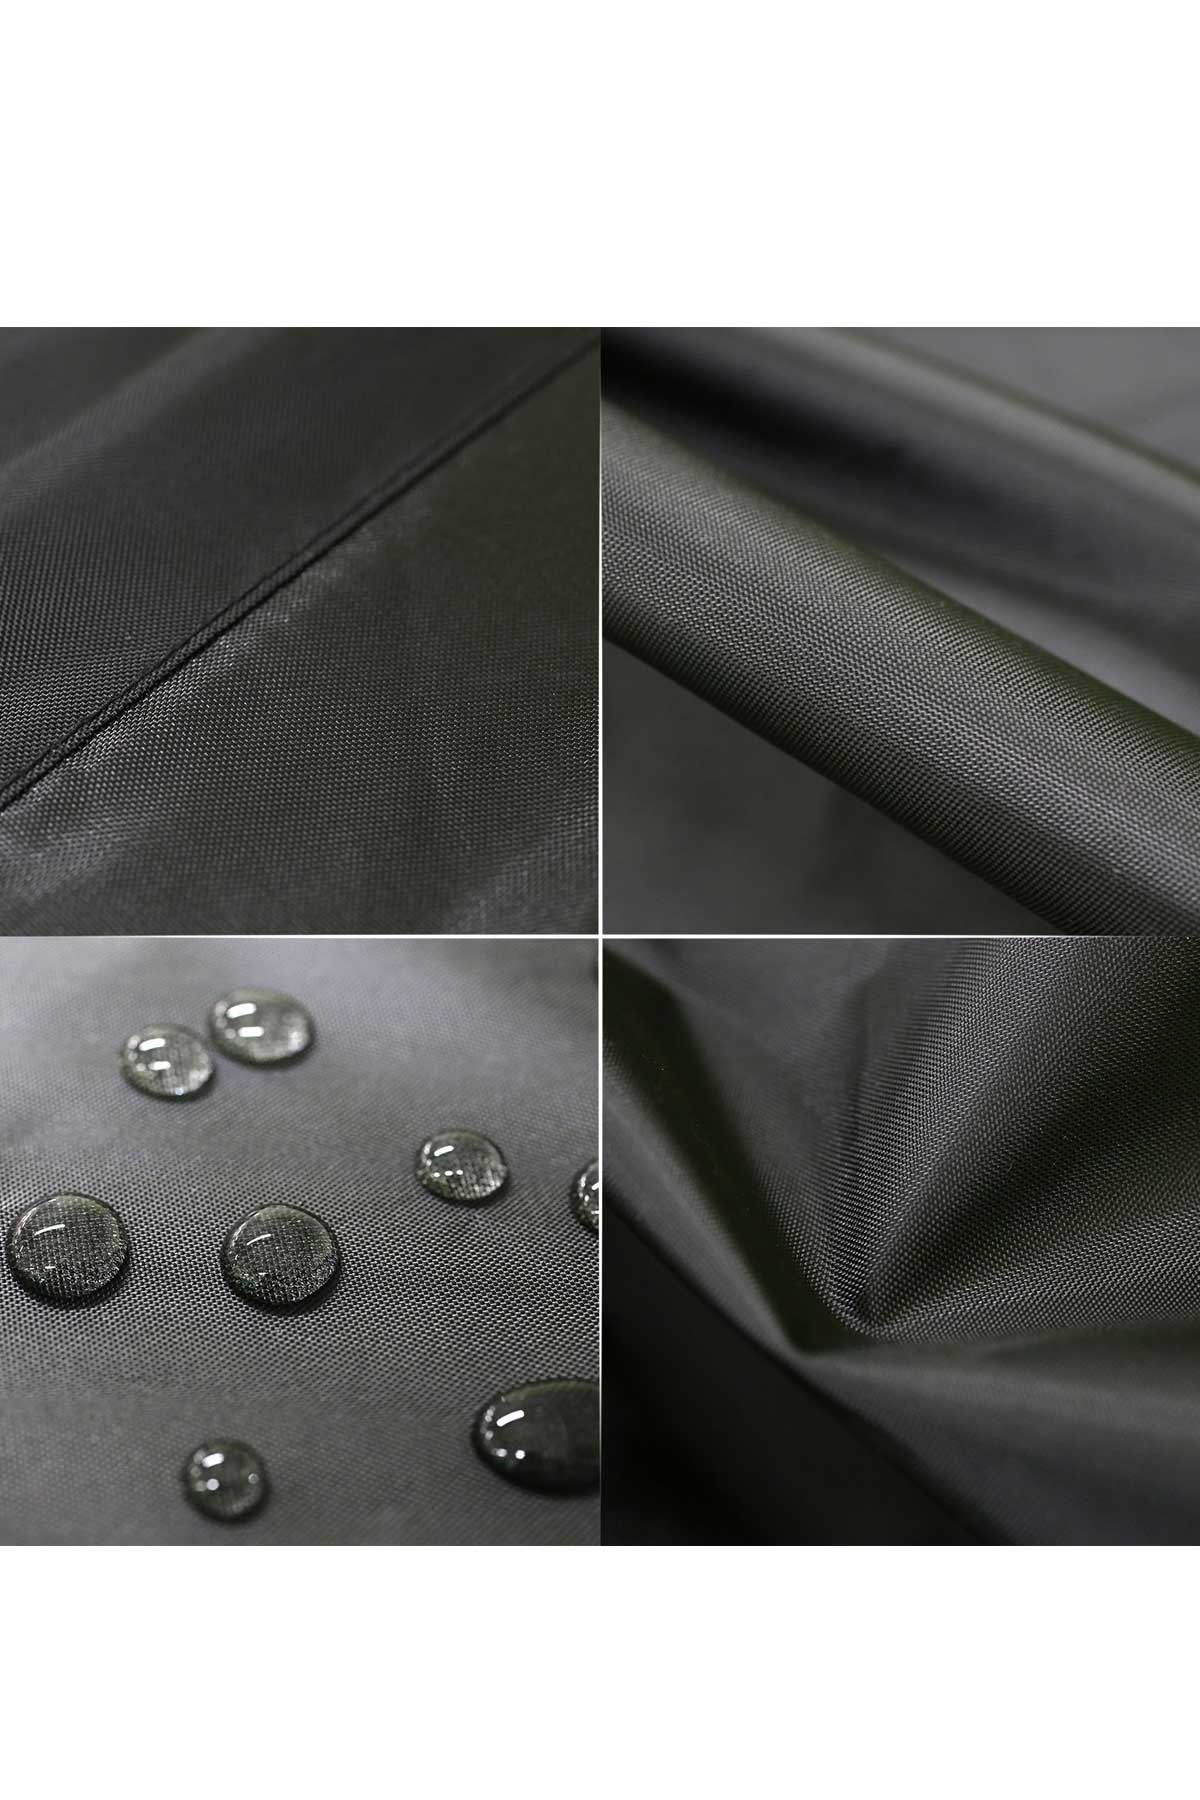 Siyah Bundera Cover Bahçe Mobilya Örtüsü